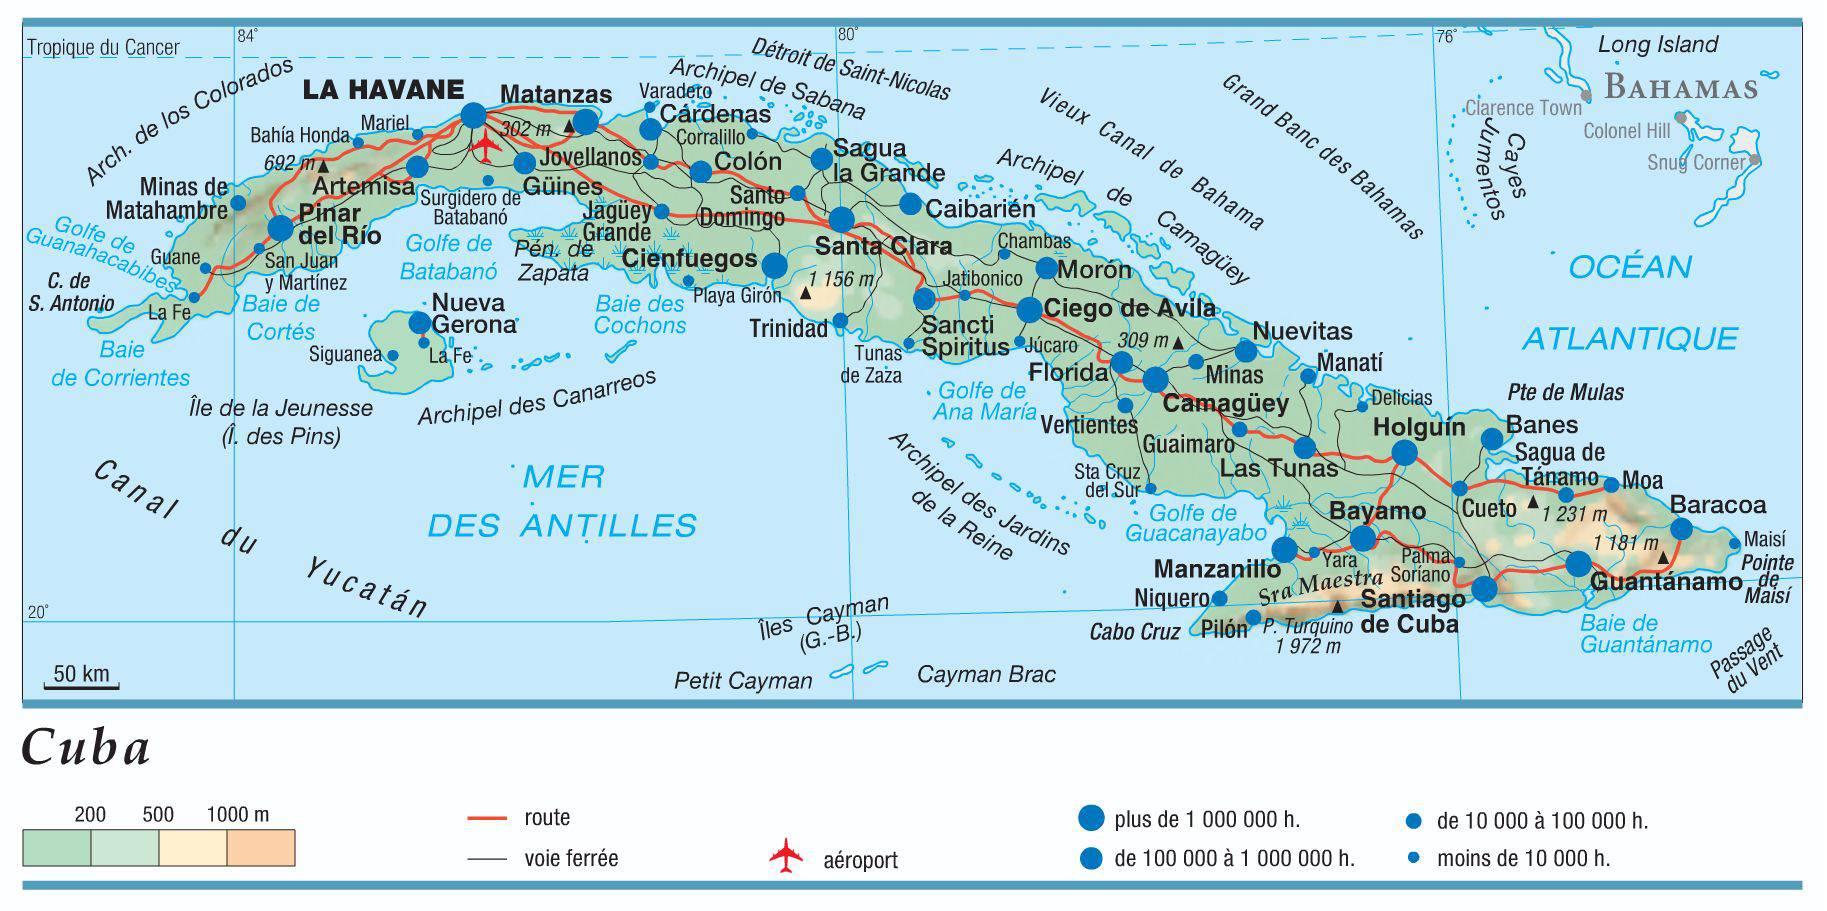 Carte administrative de Cuba